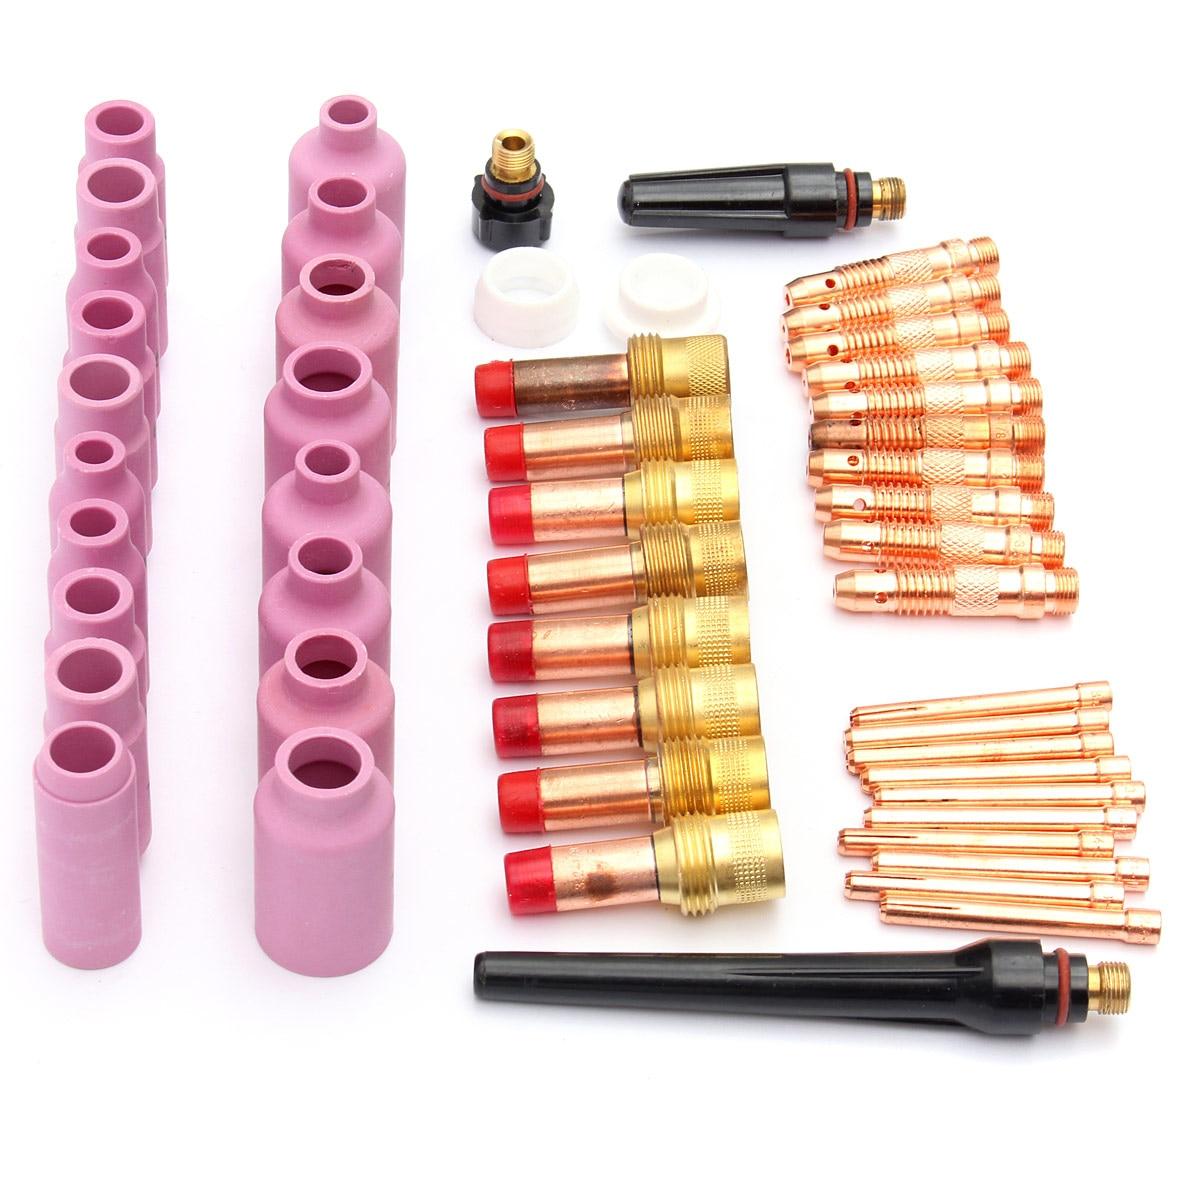 51pcs set TIG Welding Torch Accessories Consumables FIT WP 17 18 26 Series Gas Lens Nozzles